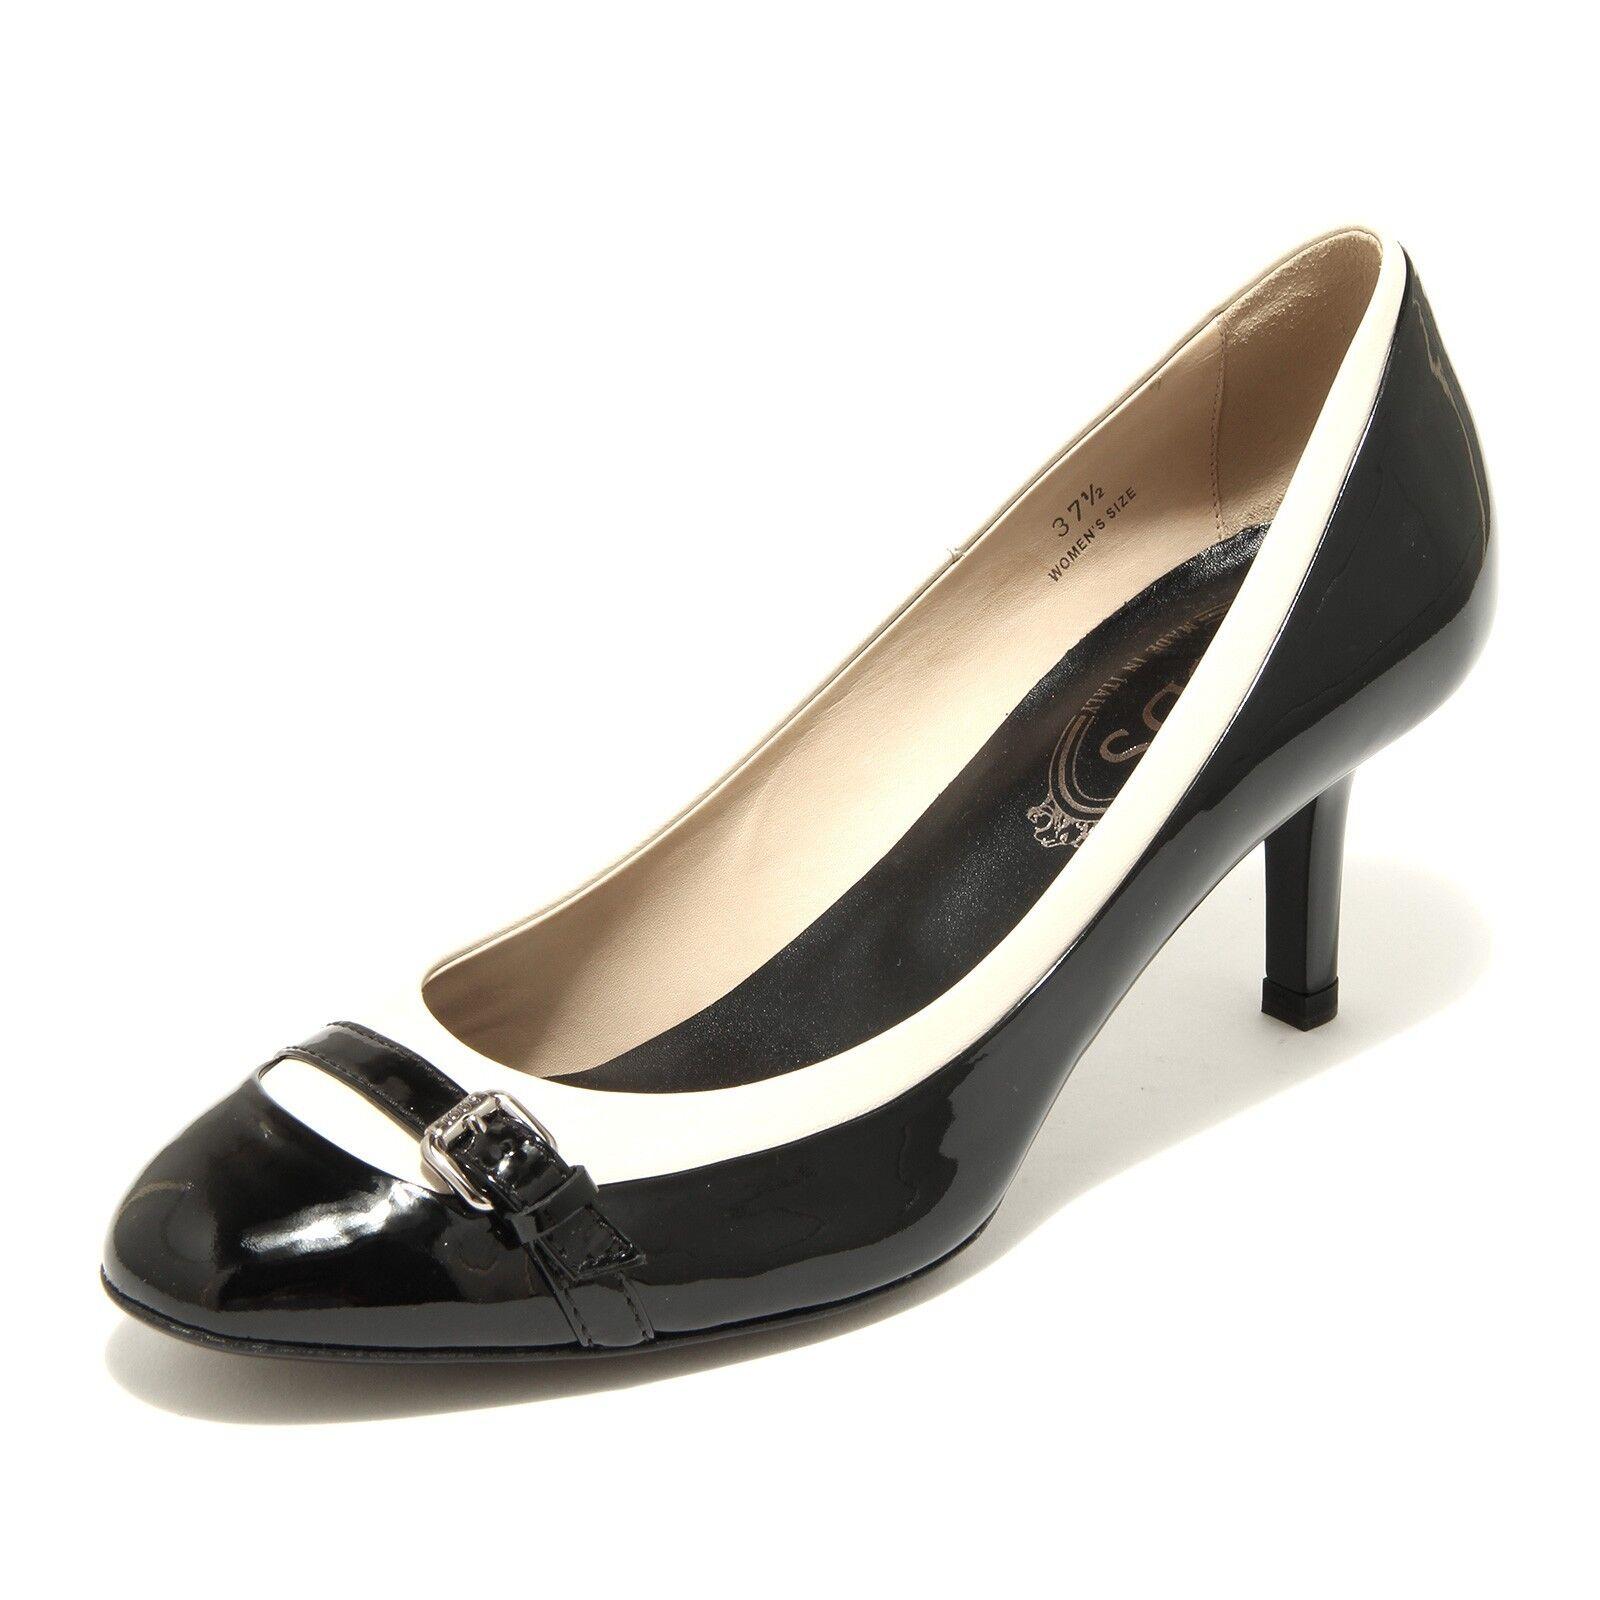 43104 decollete Tod's Scarpa mujer zapatos mujer mujer mujer  encuentra tu favorito aquí